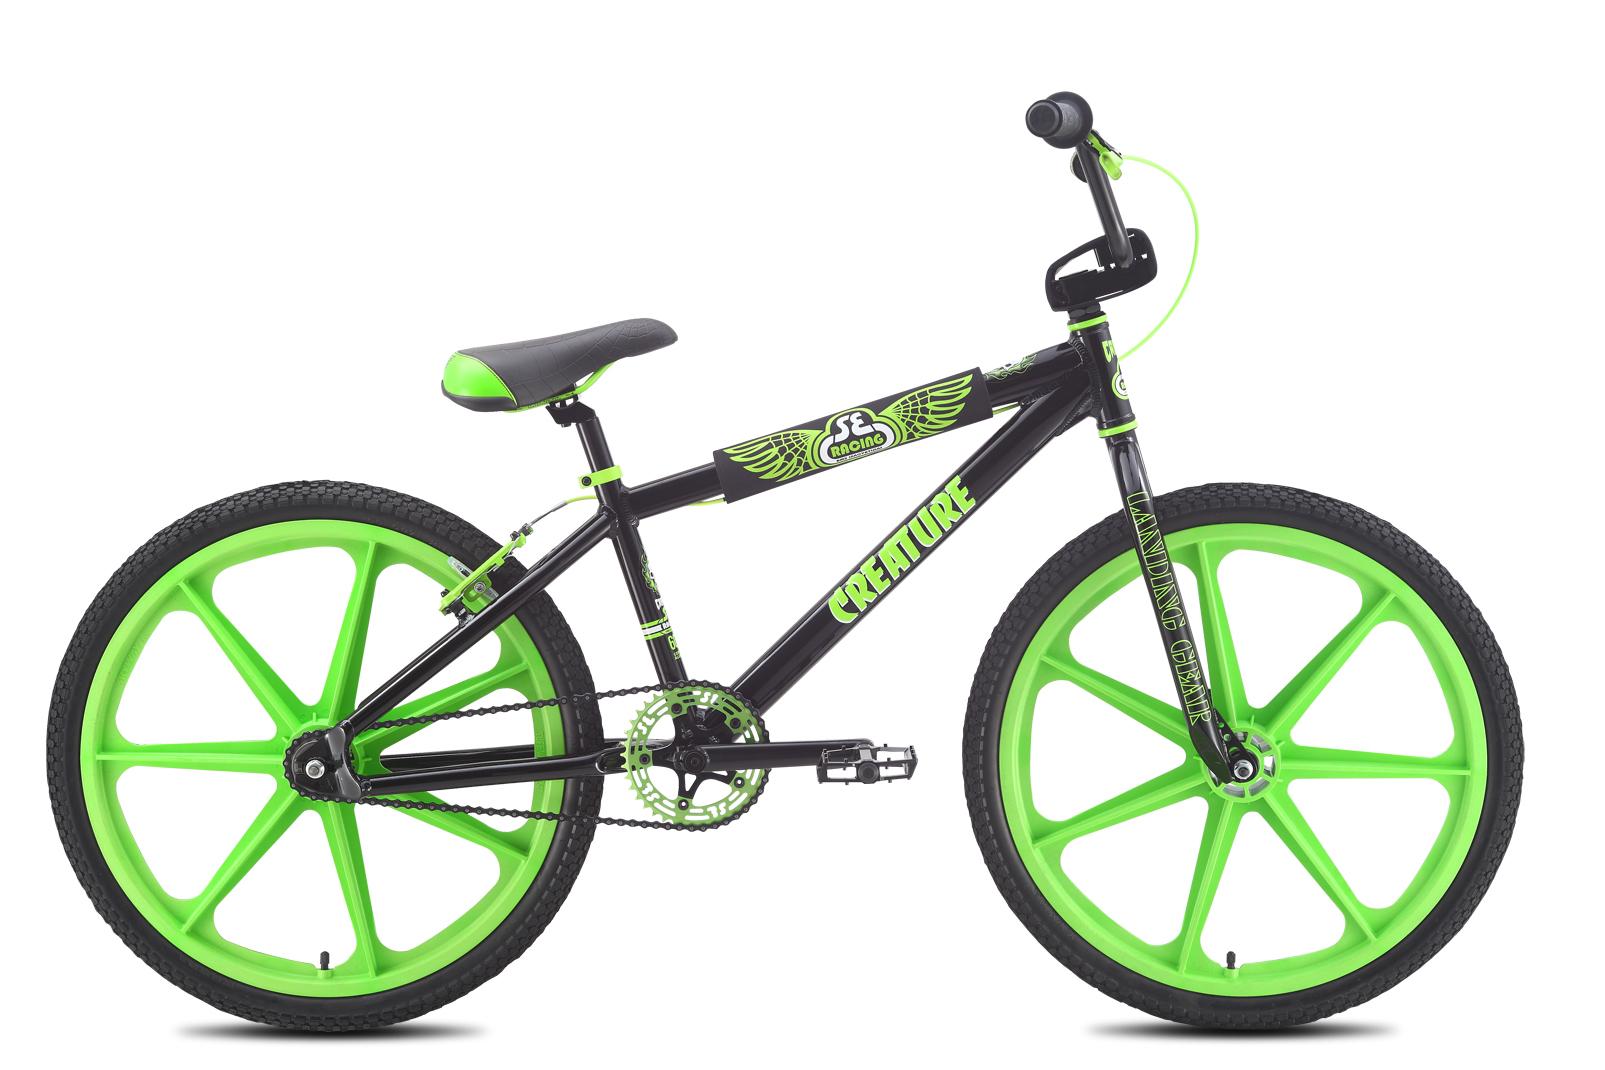 bicicleta completa bmx se bikes creature ruedas 24 negro verde. Black Bedroom Furniture Sets. Home Design Ideas